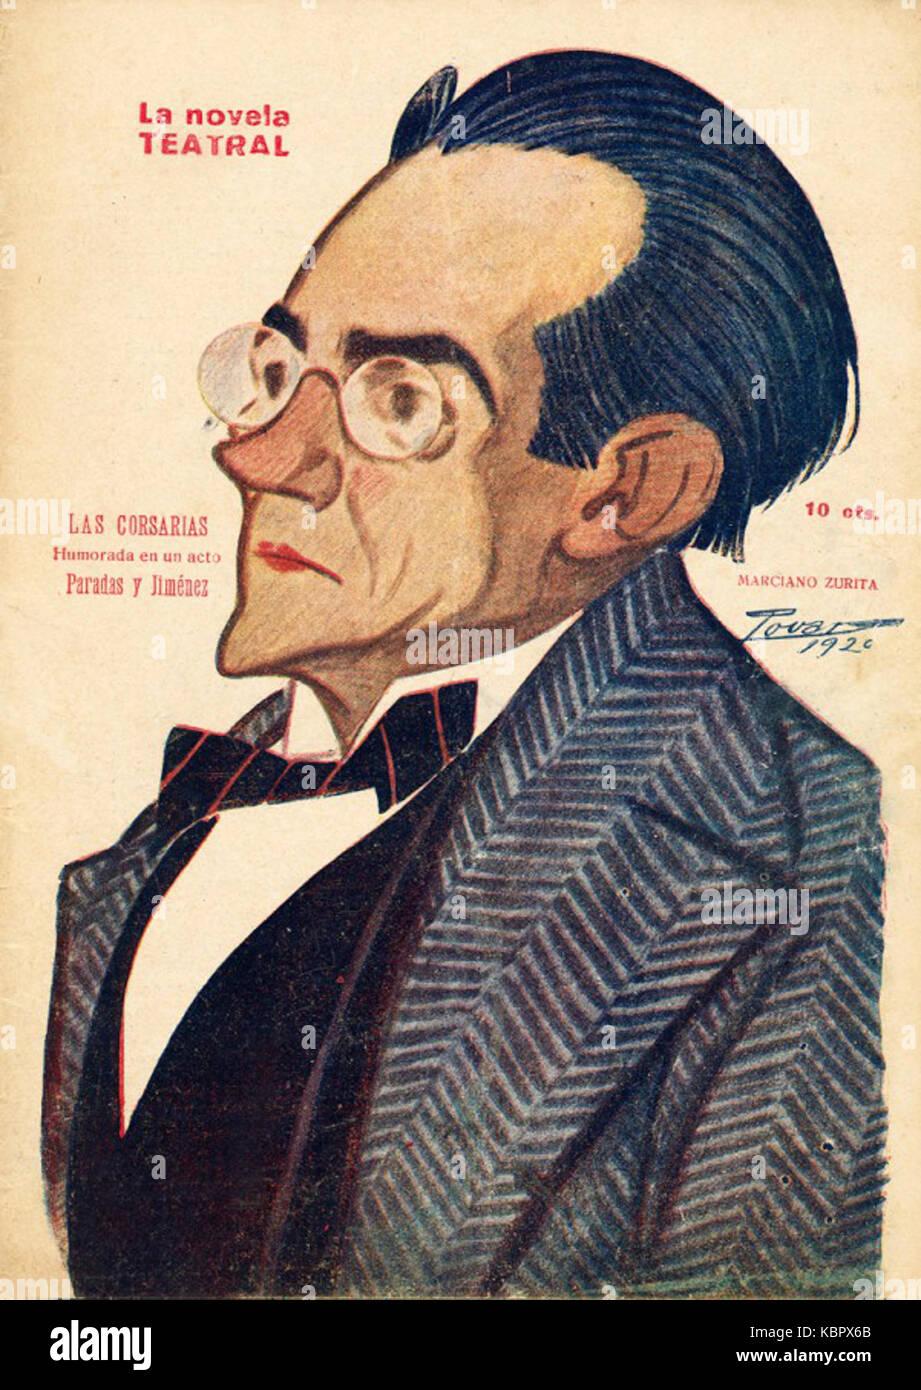 1920 02 29, La Novela Teatral, Marciano Zurita, Tovar - Stock Image